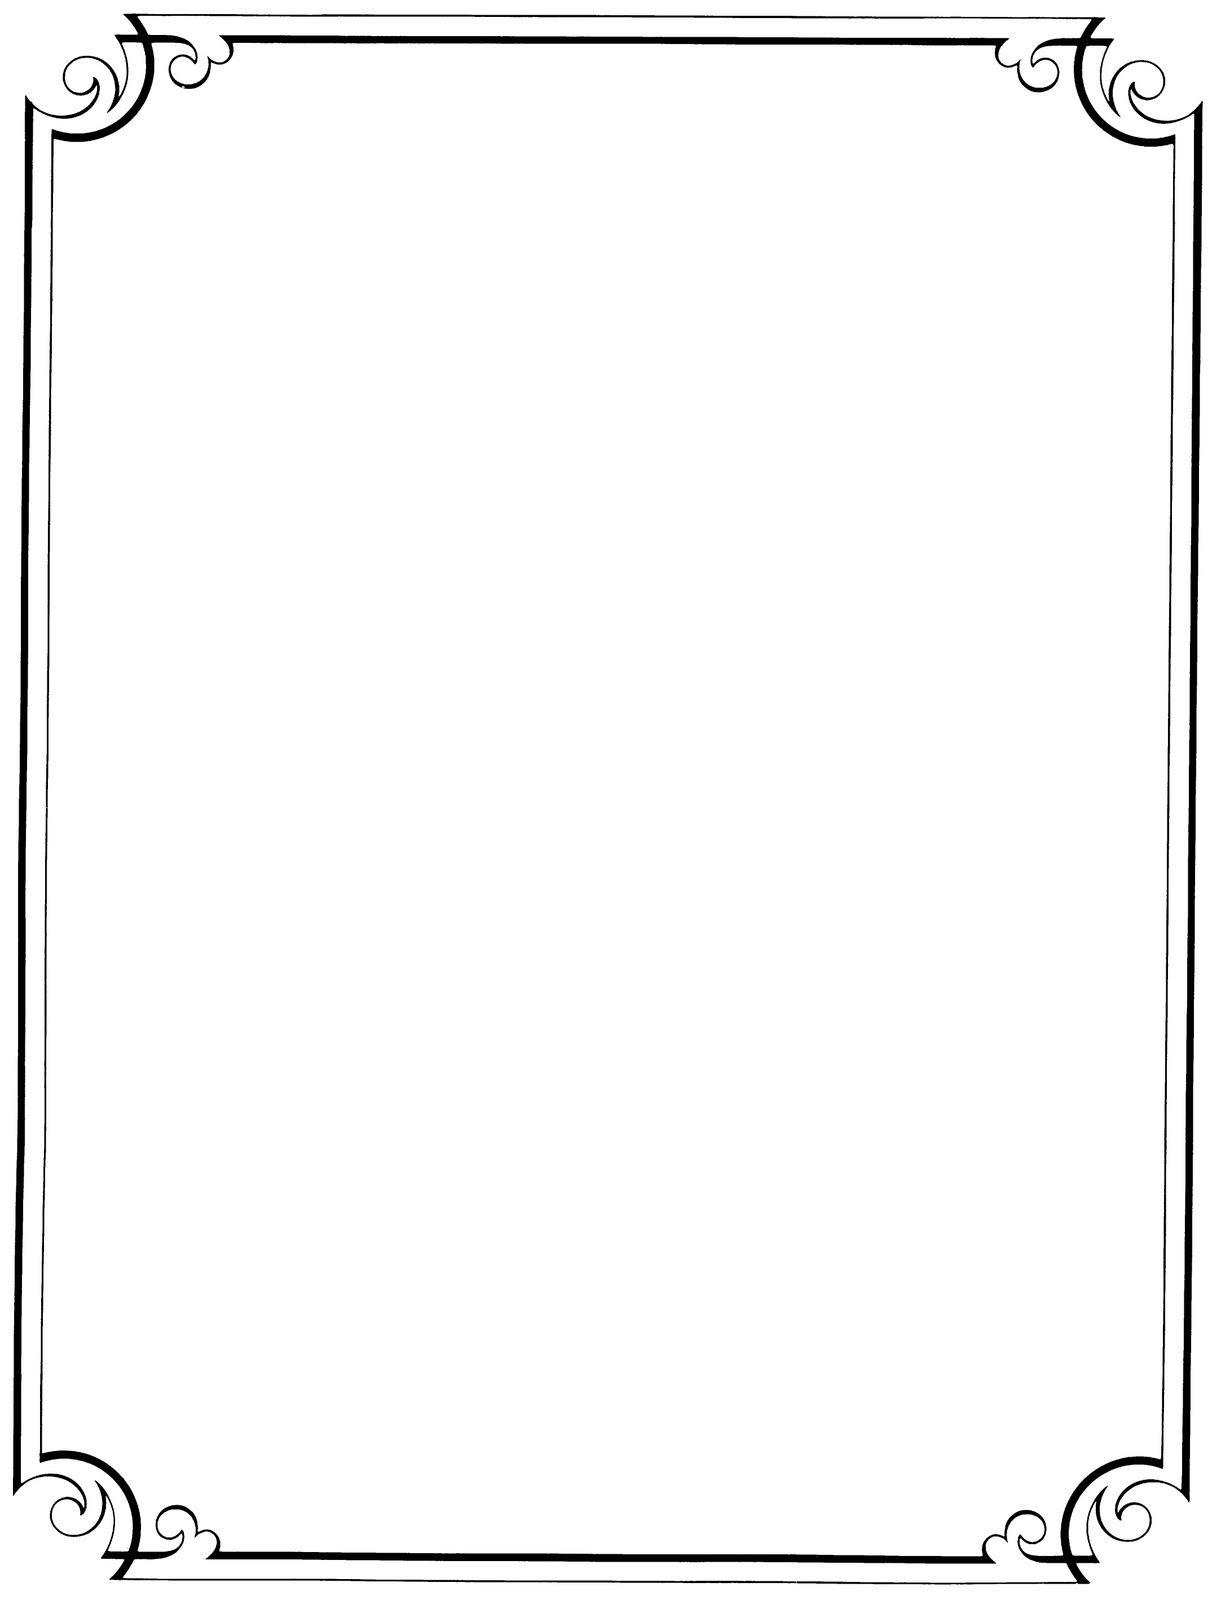 Free Printable Clip Art Borders |  : Free Vintage Clip Art - Free Printable Clip Art Borders